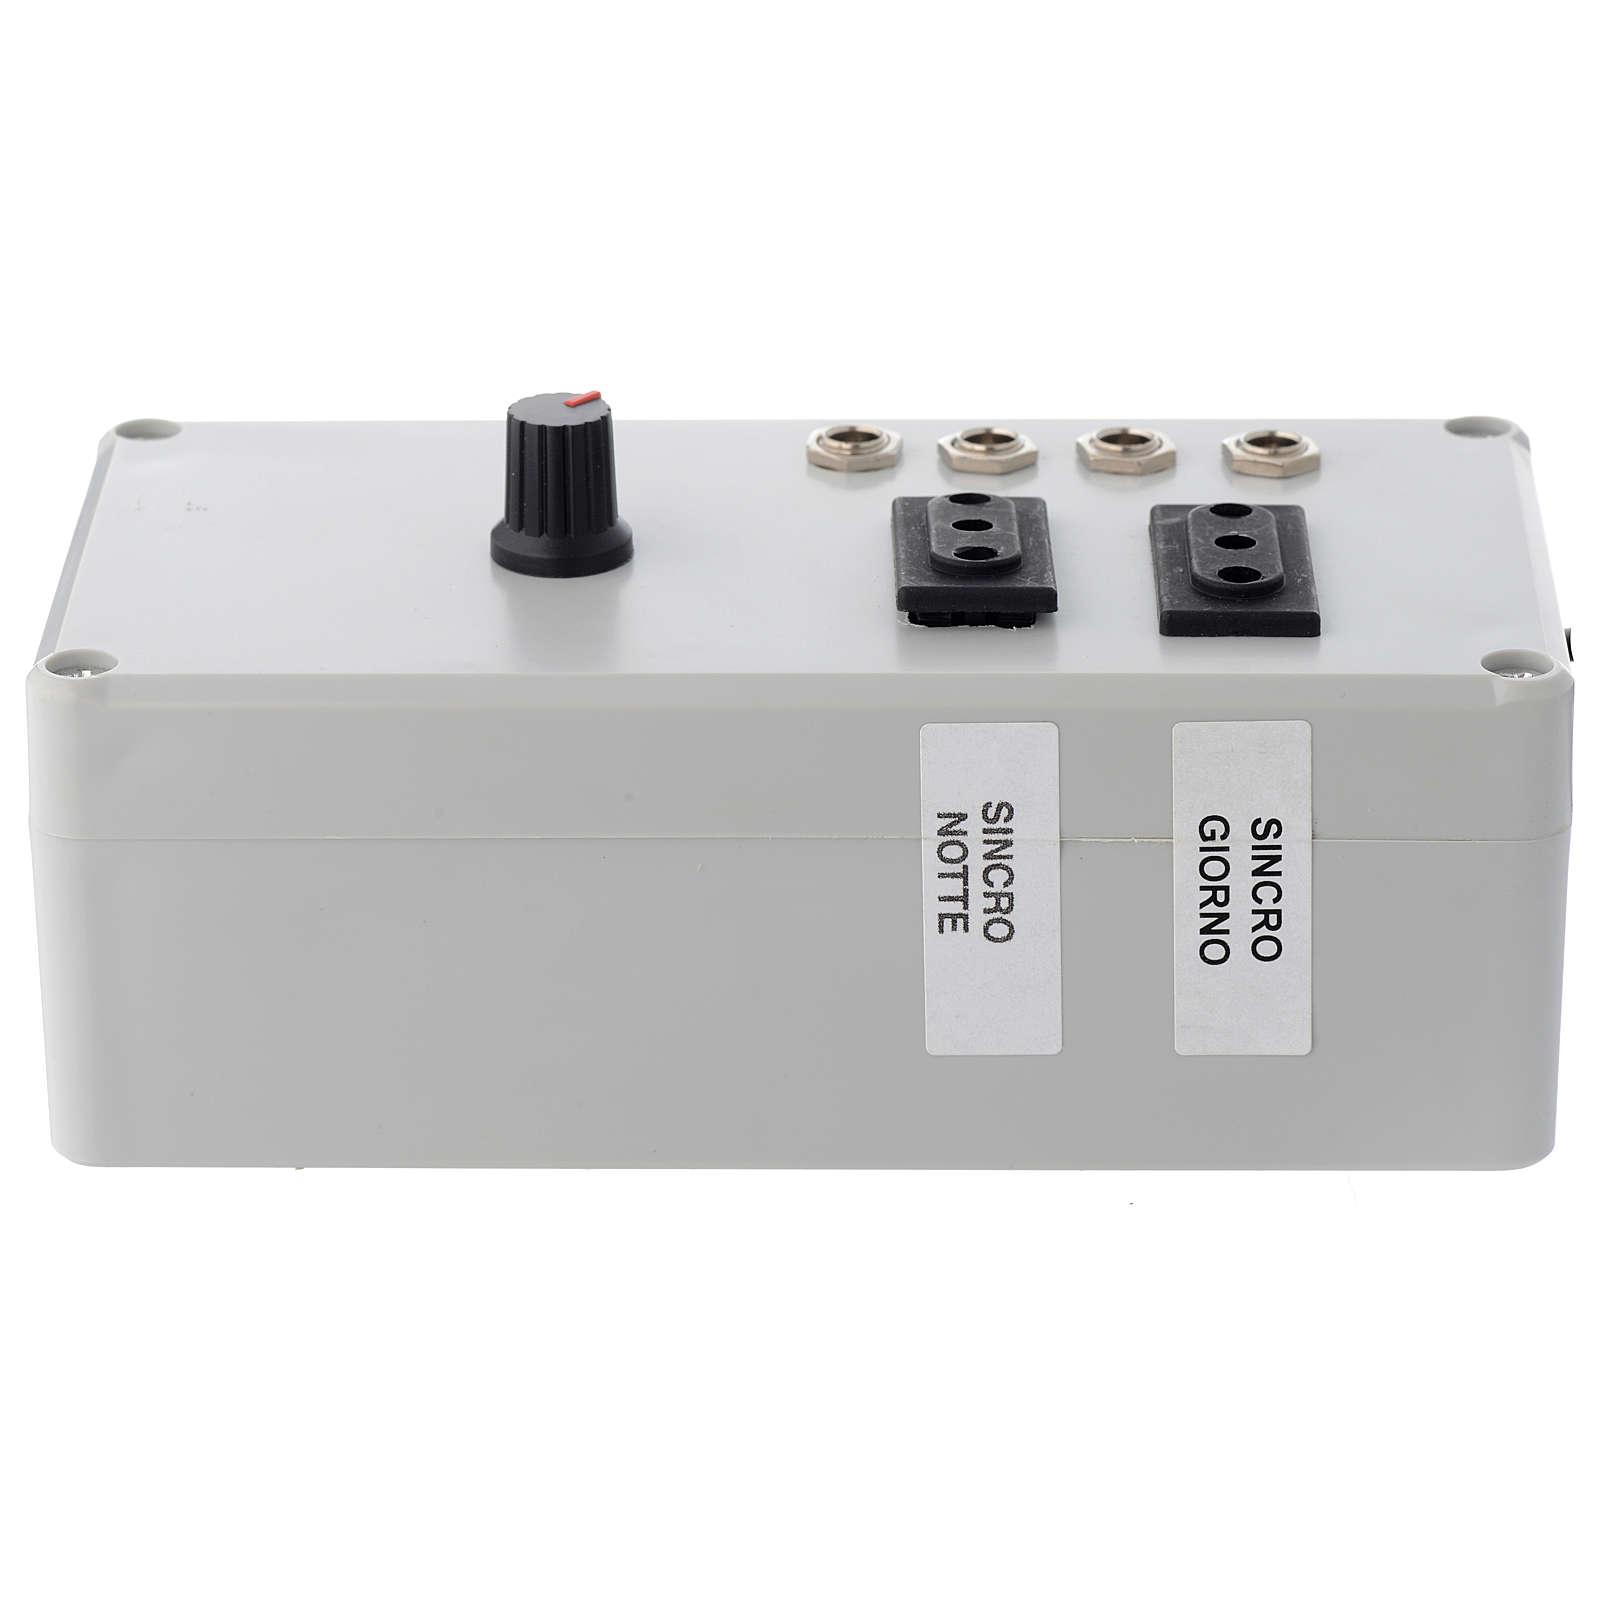 Electric box Mastro LED 4+2 da 24W and synchro plug 220 V 4